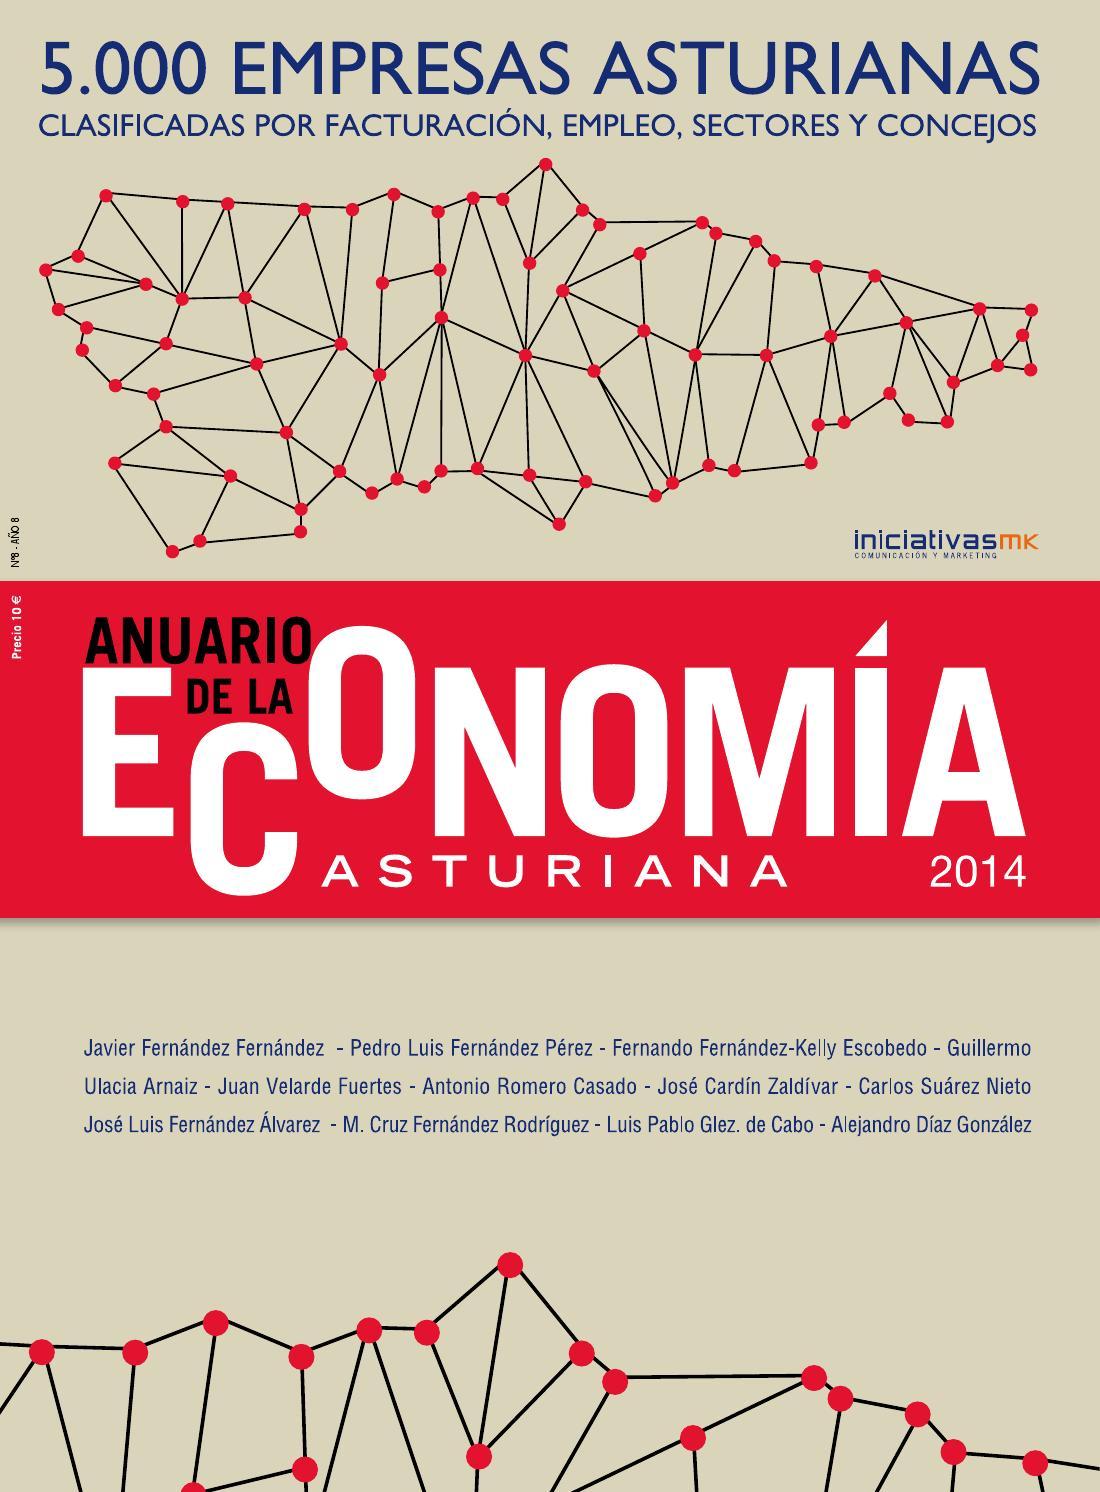 Anuario De La Economa Asturiana 2014 By Iniciativasmk Issuu Jpgviews 654size 1503 Kbdescription Dan Baldwin Lipo Balancer